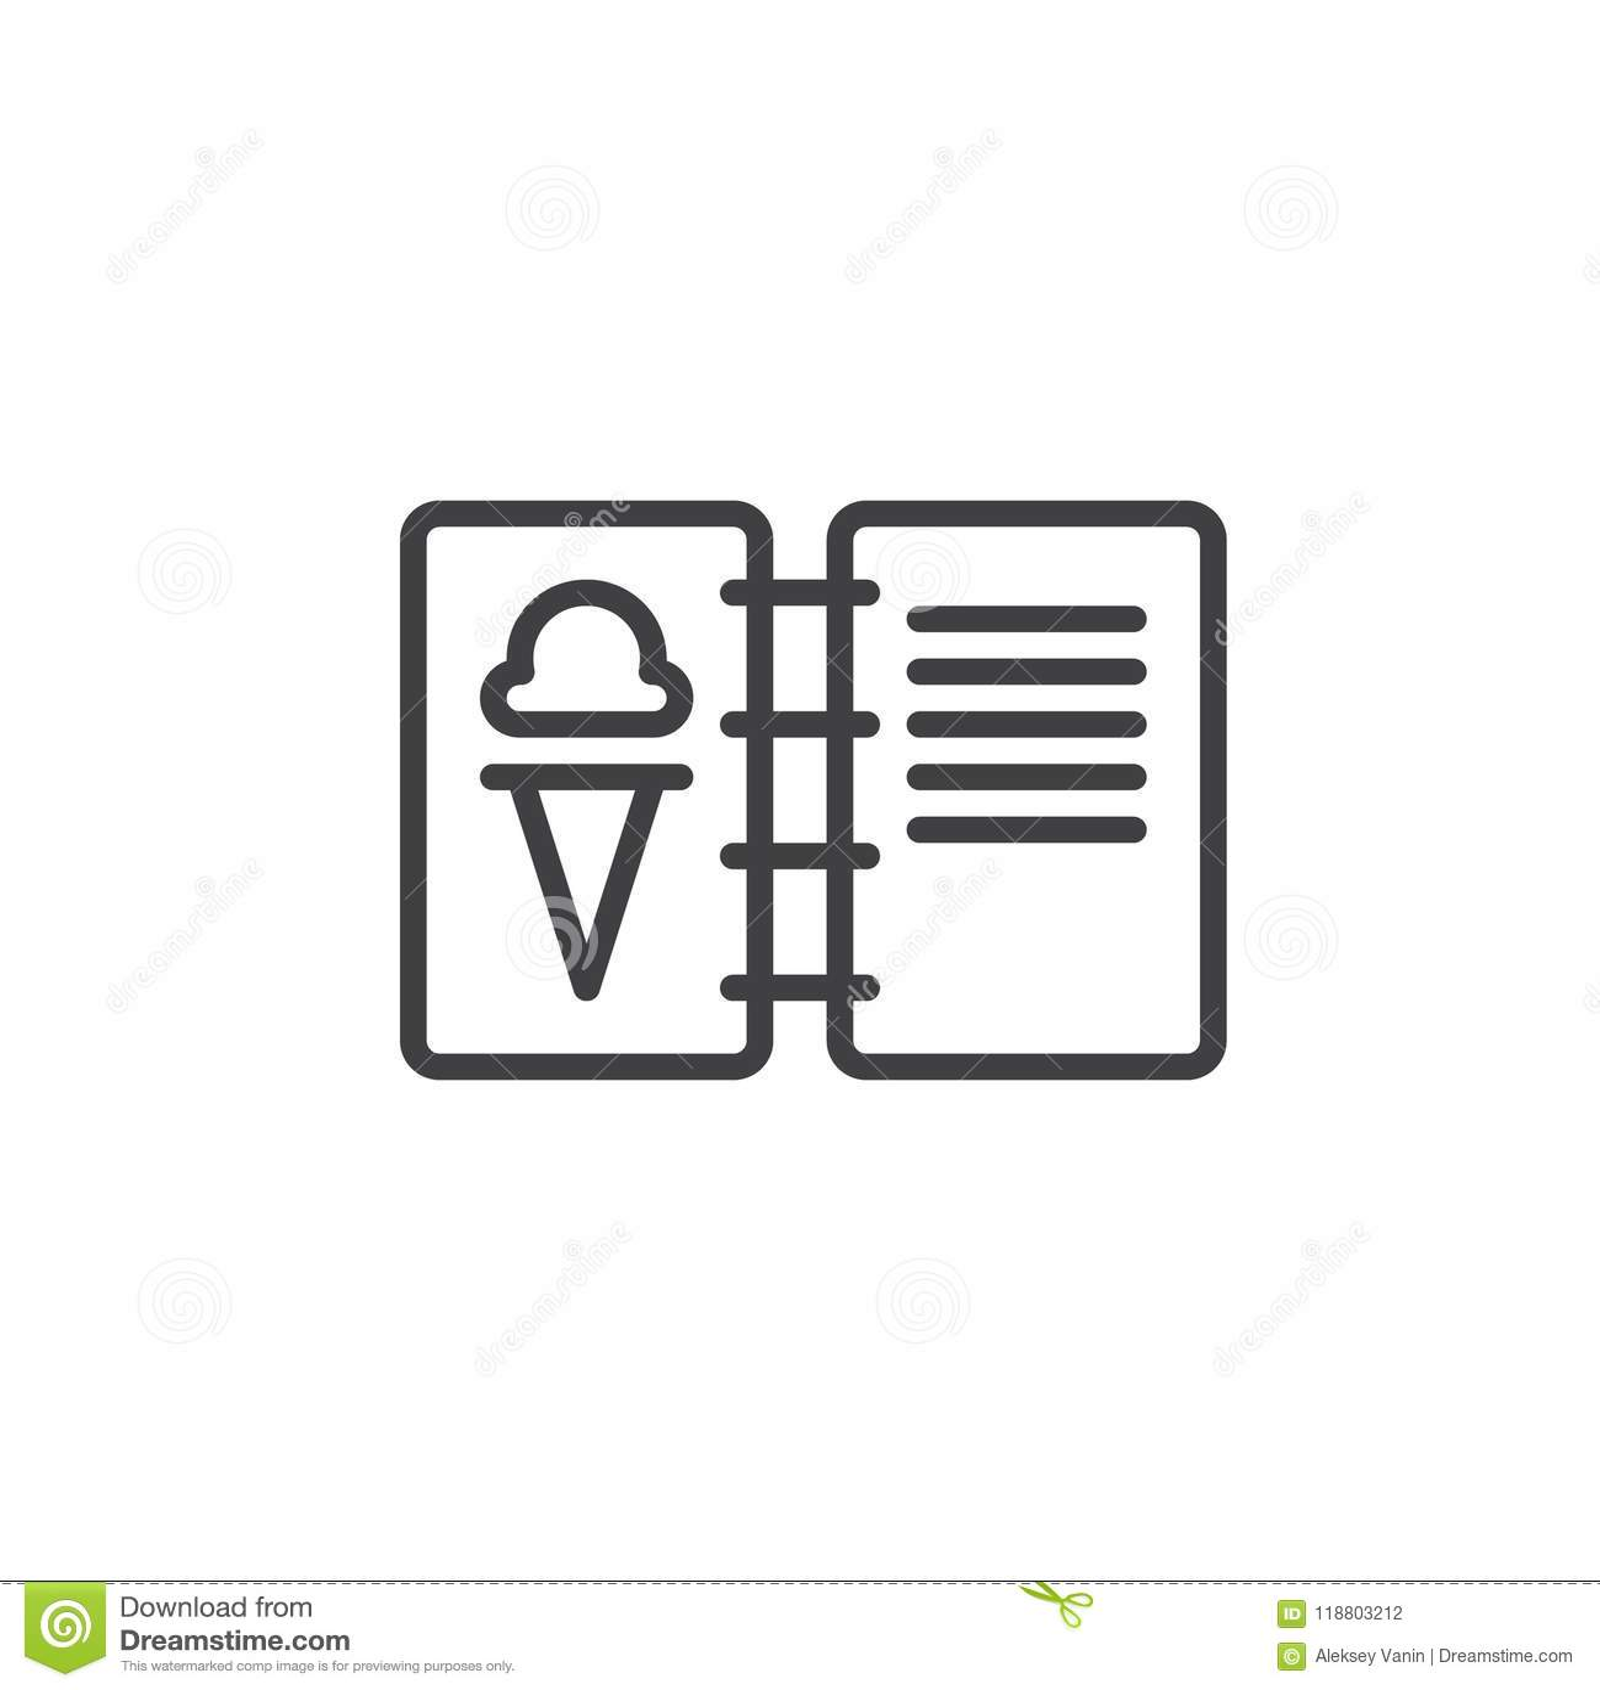 ice cream menu outline icon stock vector illustration of icon